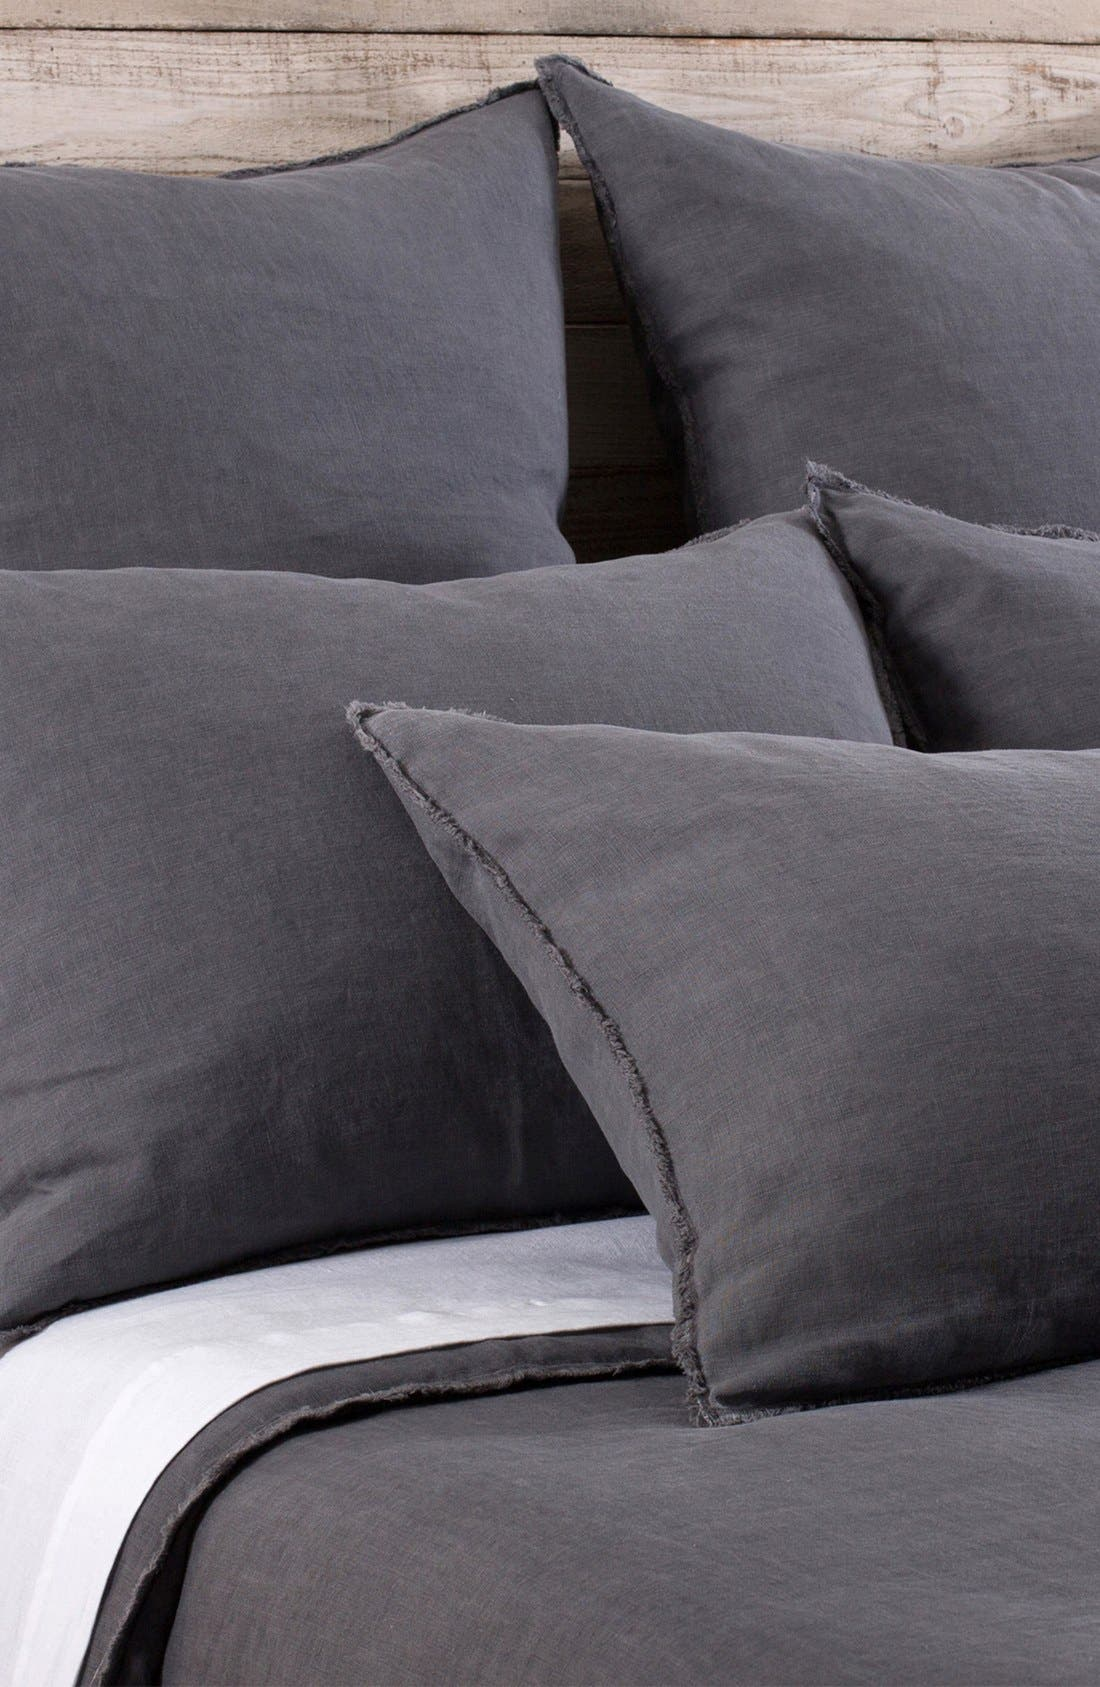 'Blair' Linen Duvet Cover,                         Main,                         color, Midnight